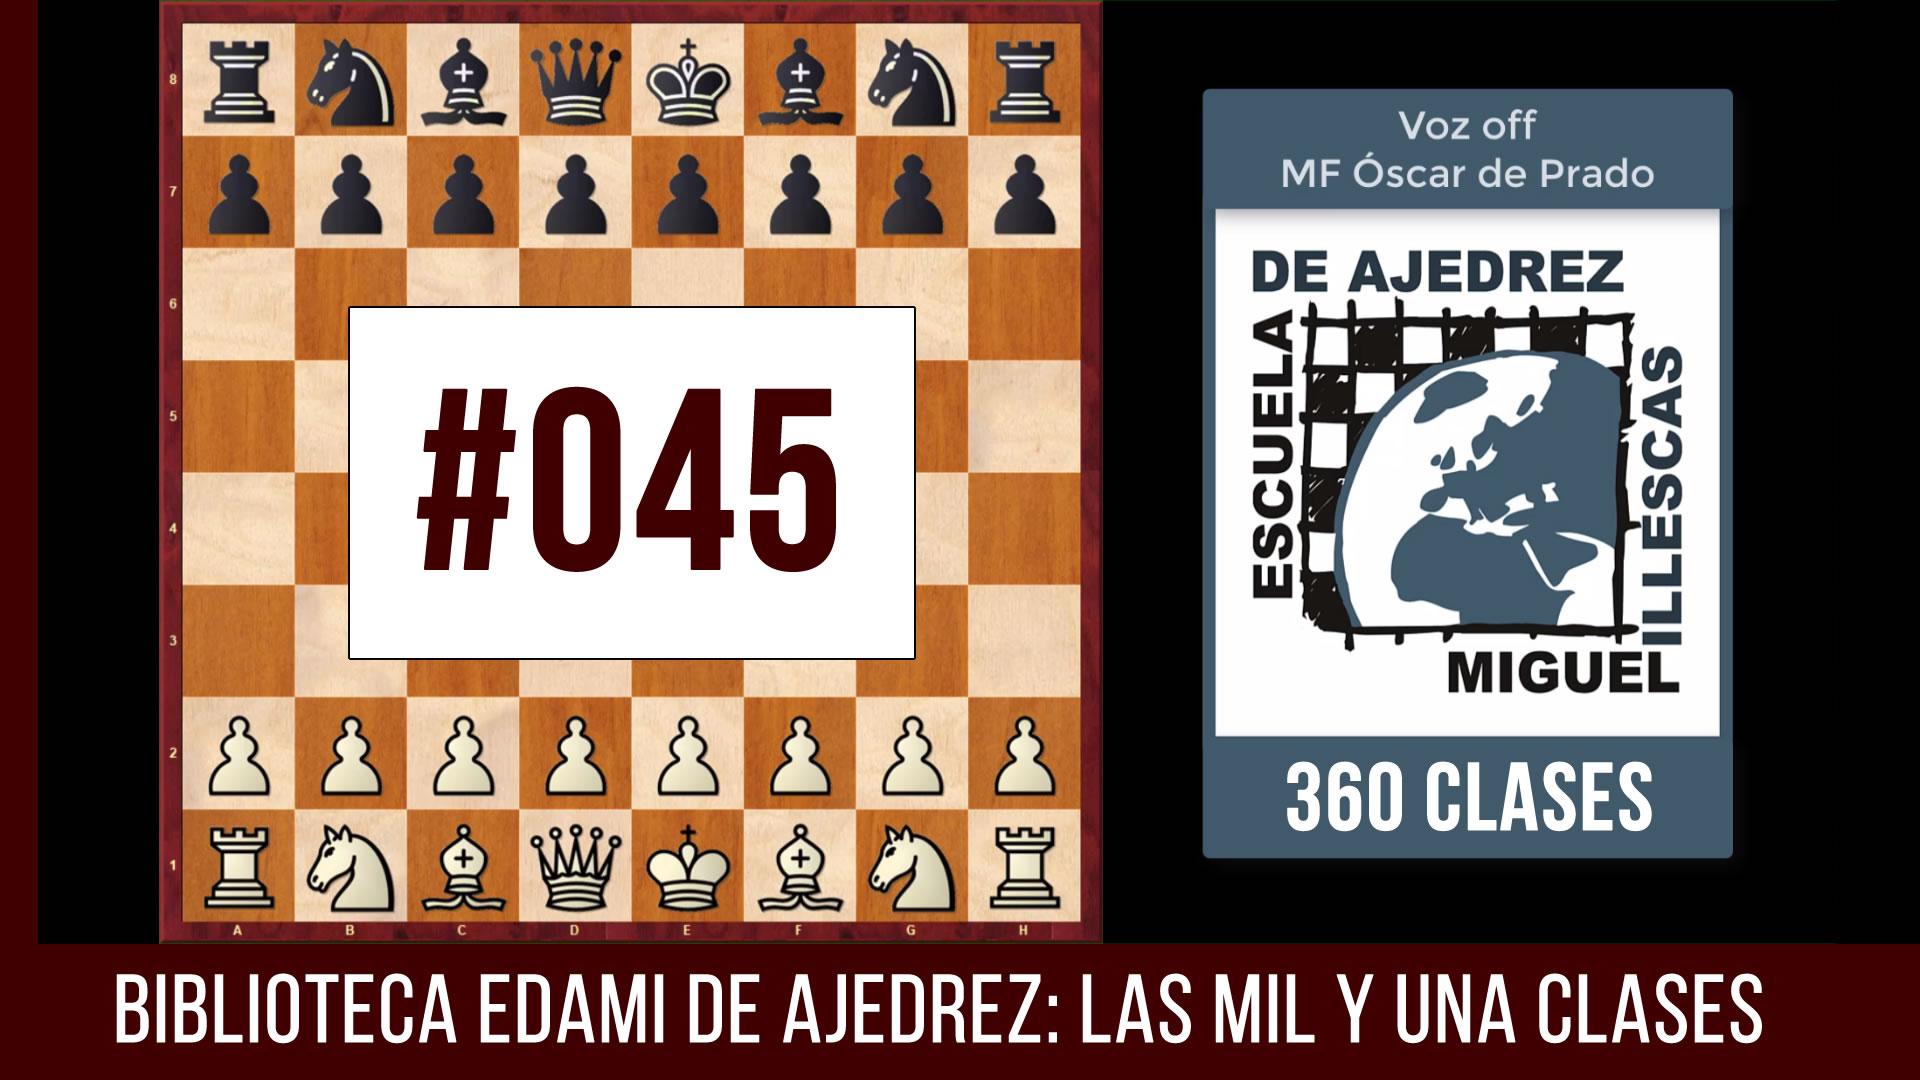 Clases de ajedrez #045 - EDAMI